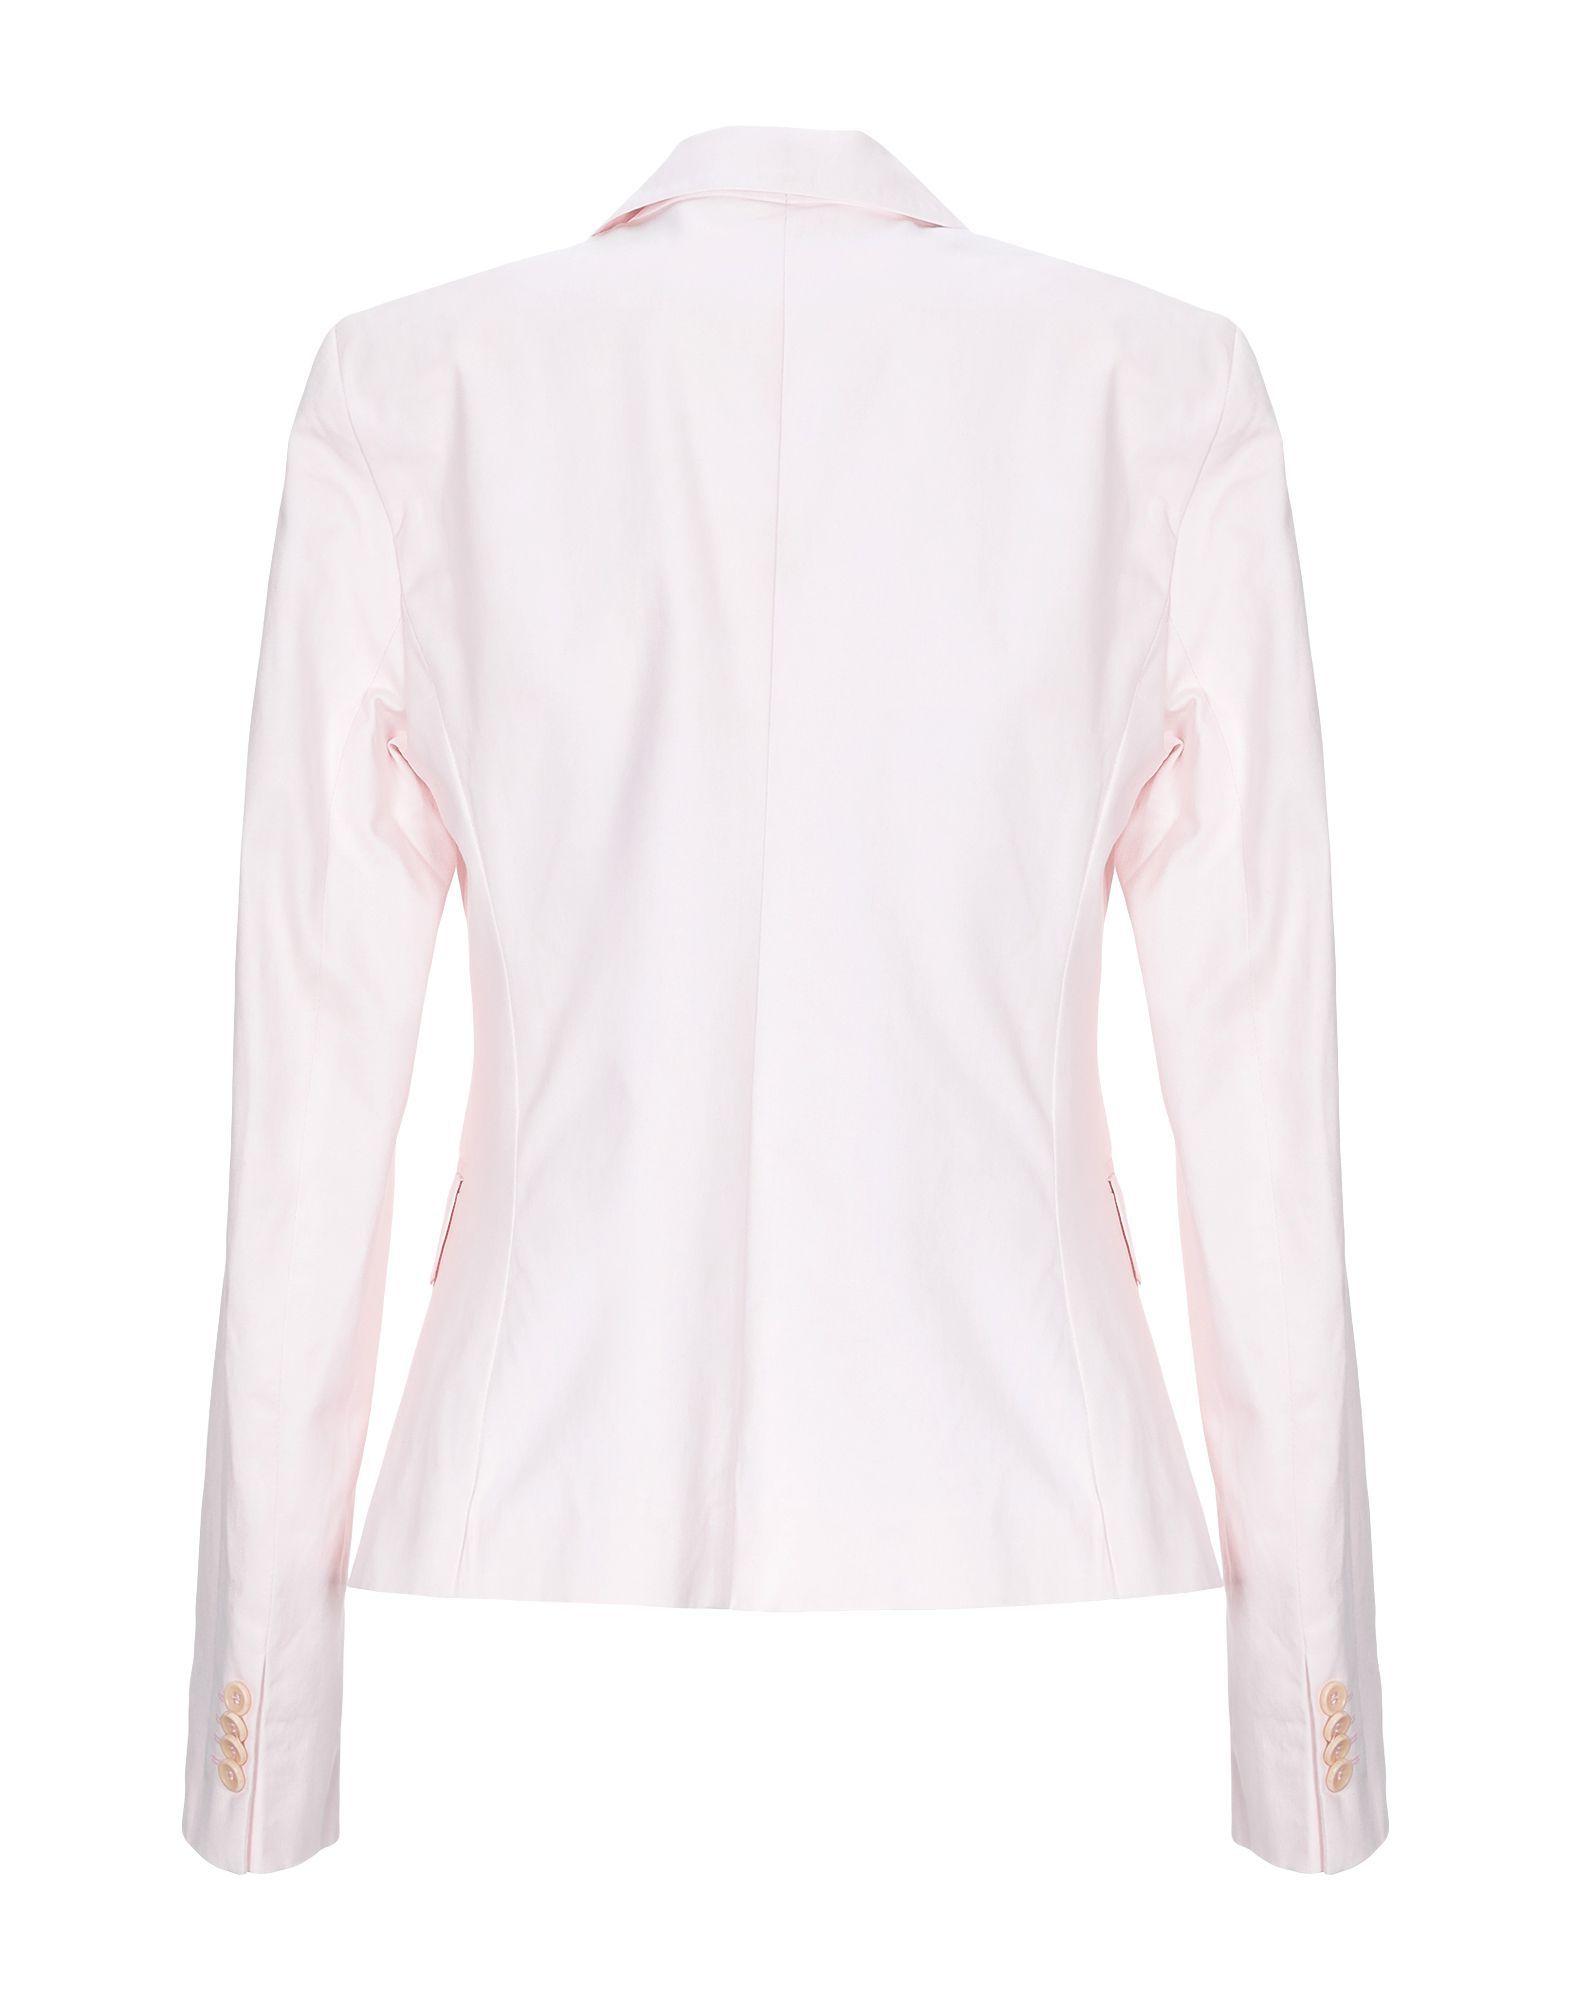 Daniele Alessandrini Pink Cotton Single Breasted Blazer